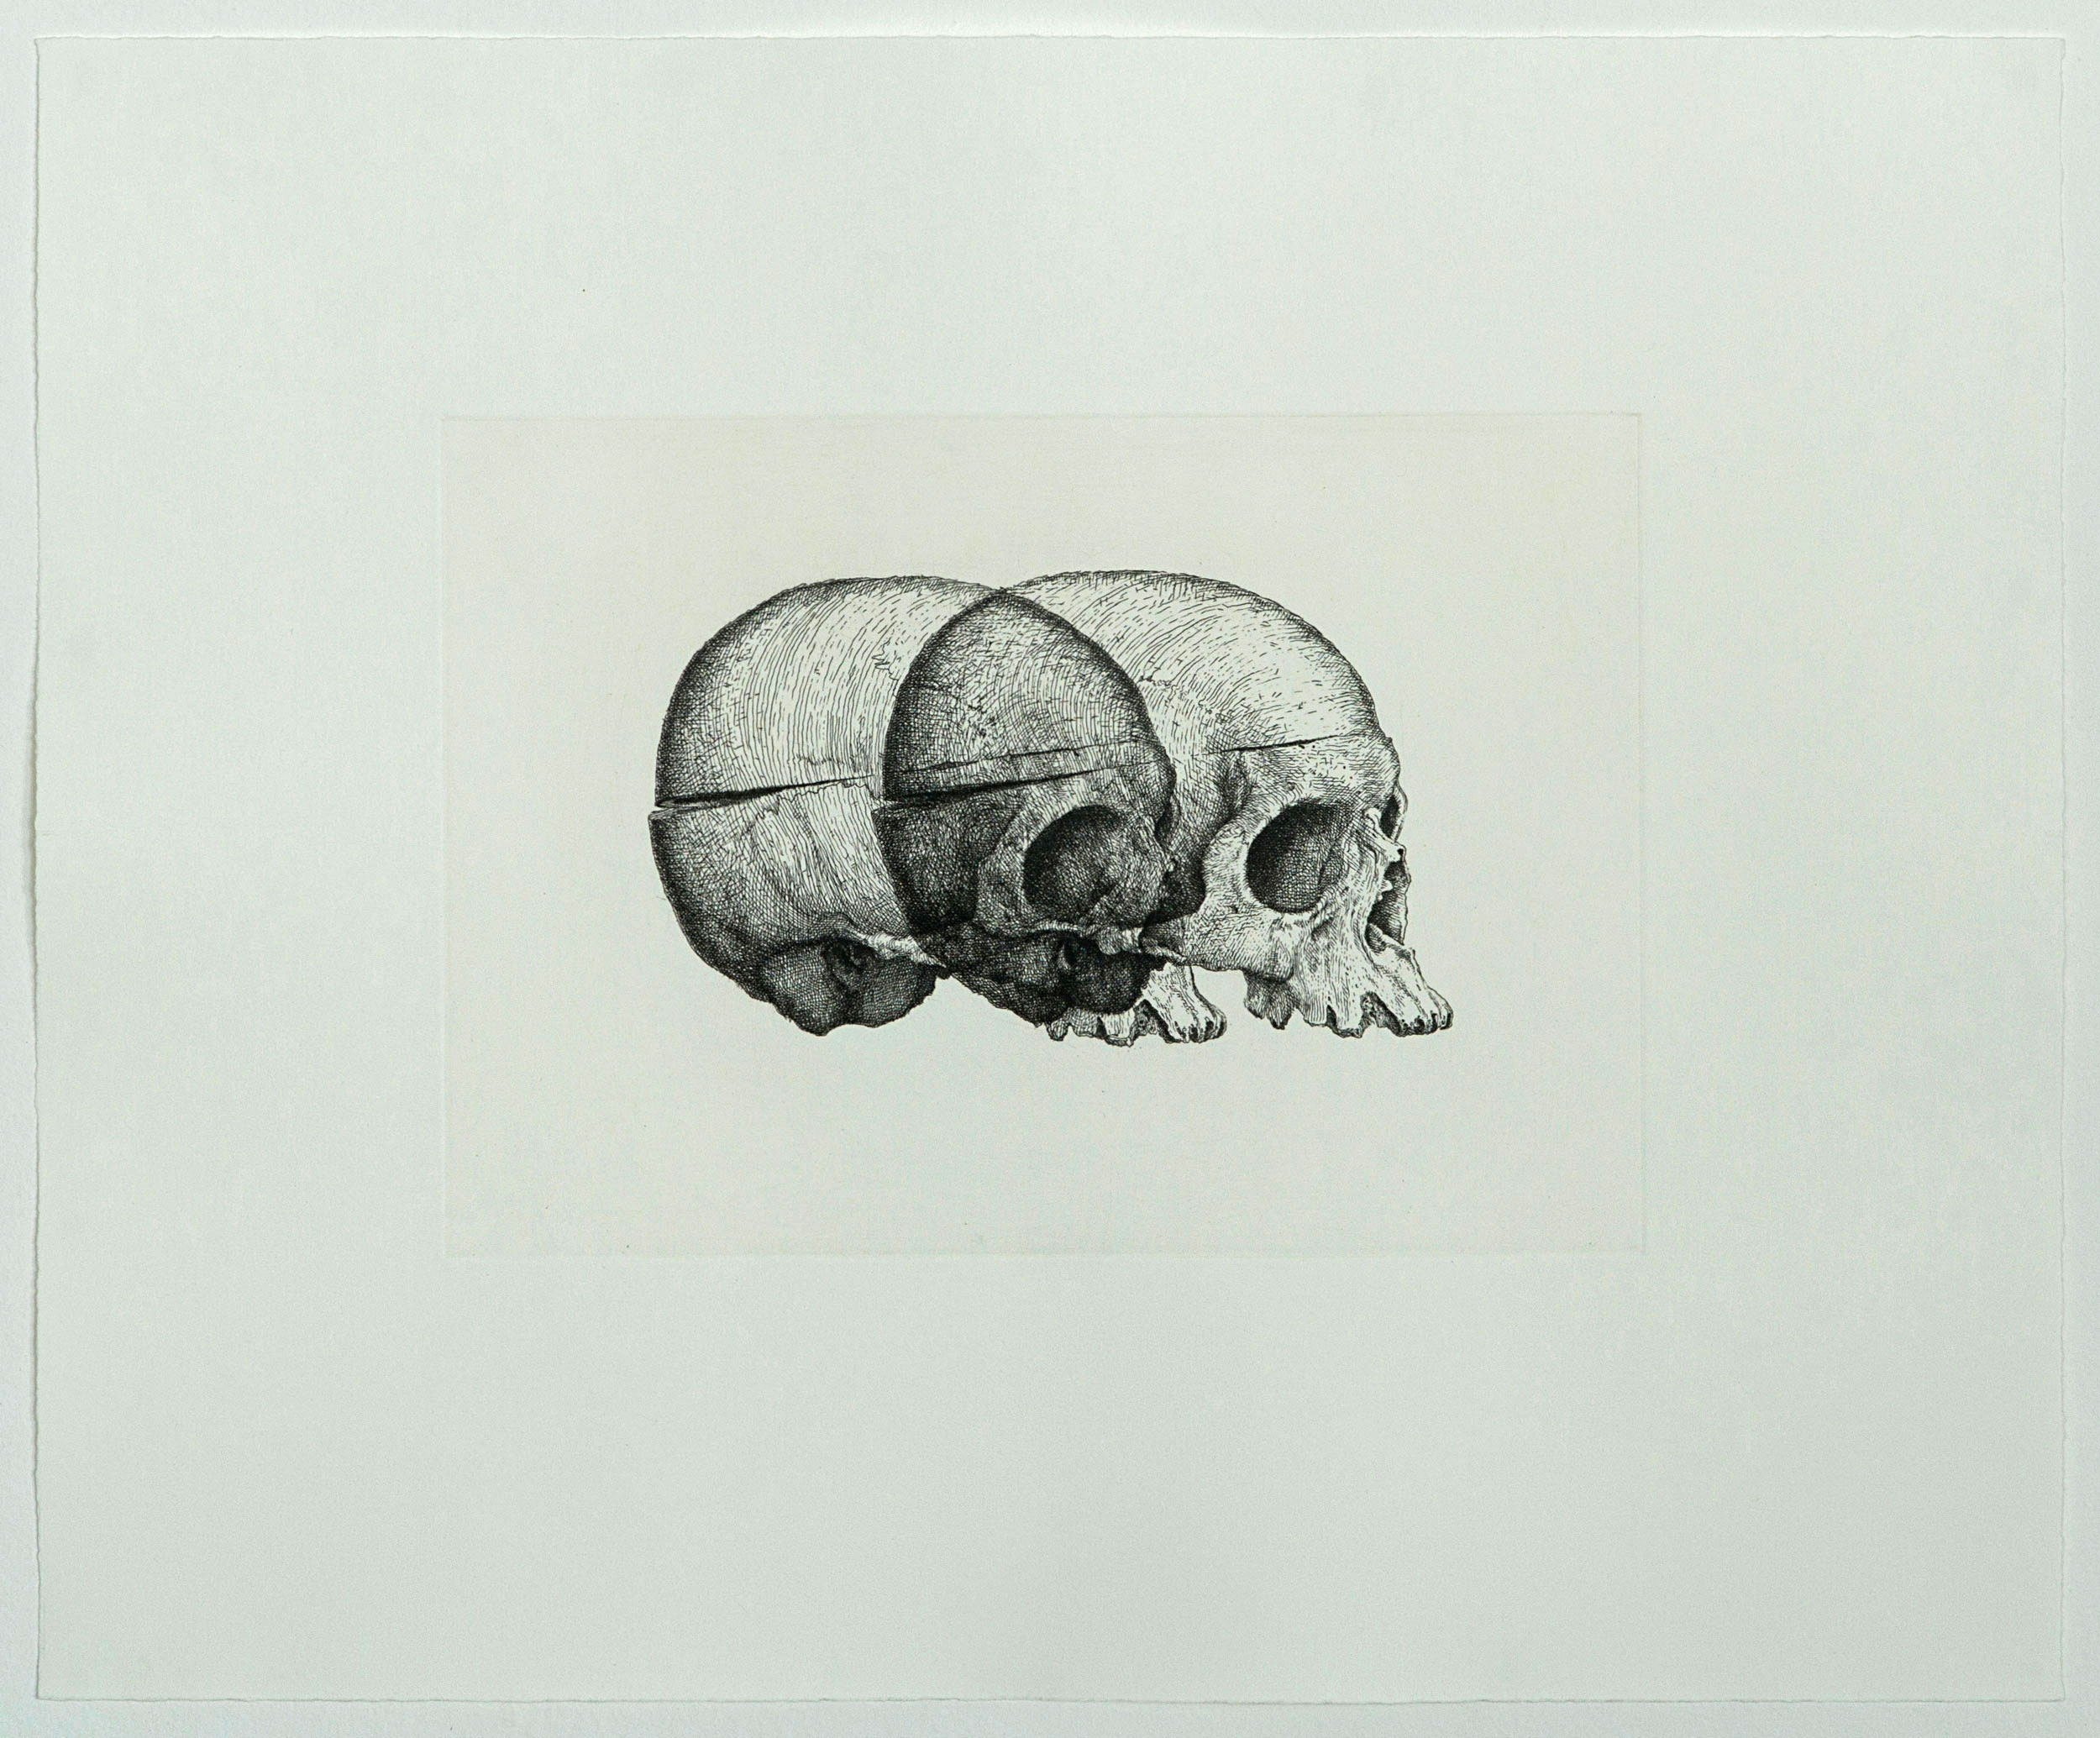 Gerhard Marx, Prints, Binocular Skull 2